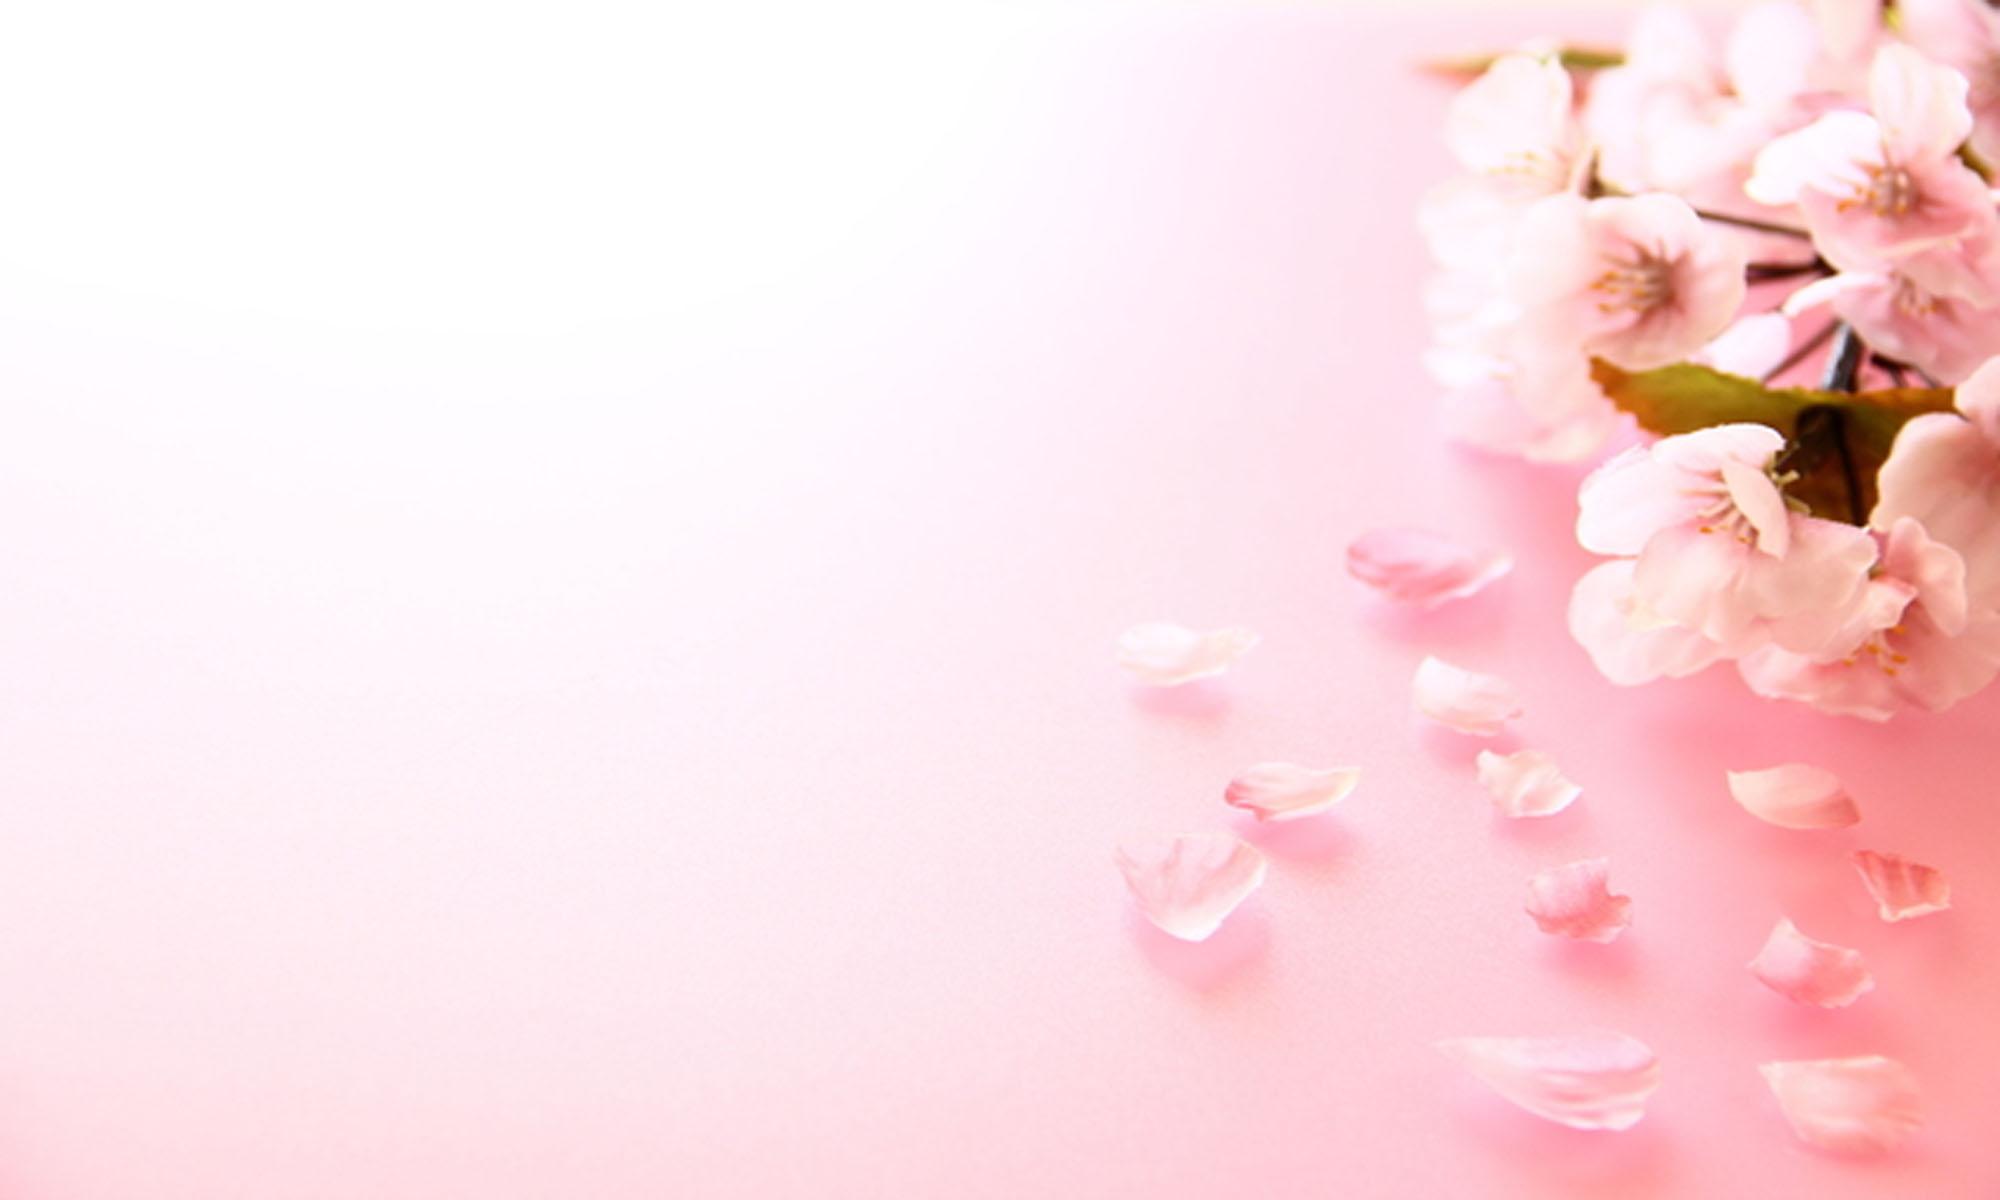 時事戯言!炎症性腸疾患!クローン病!(潰瘍性大腸炎)闘病ブログ